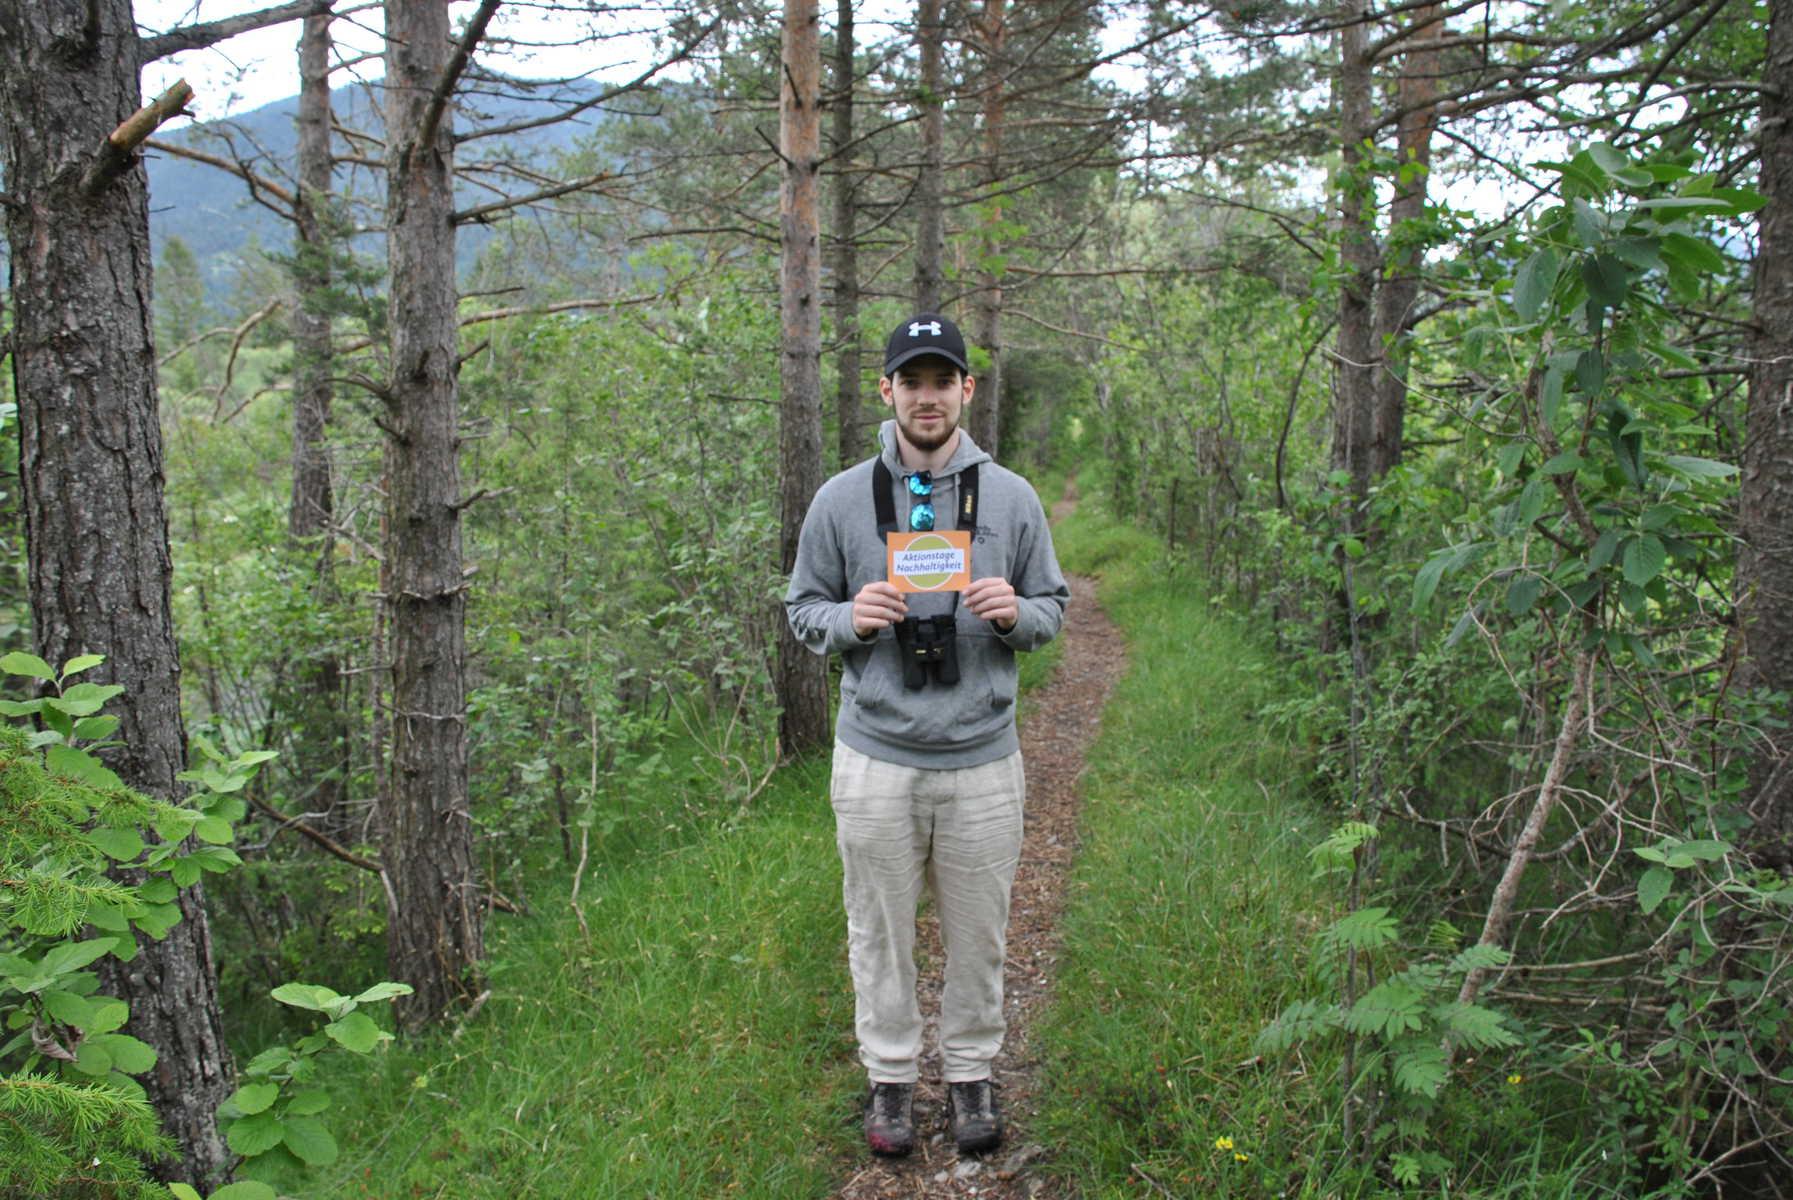 Lebendiger Lebensraum - Im Naturpark Tiroler Lech zur Auwald-Safari 8